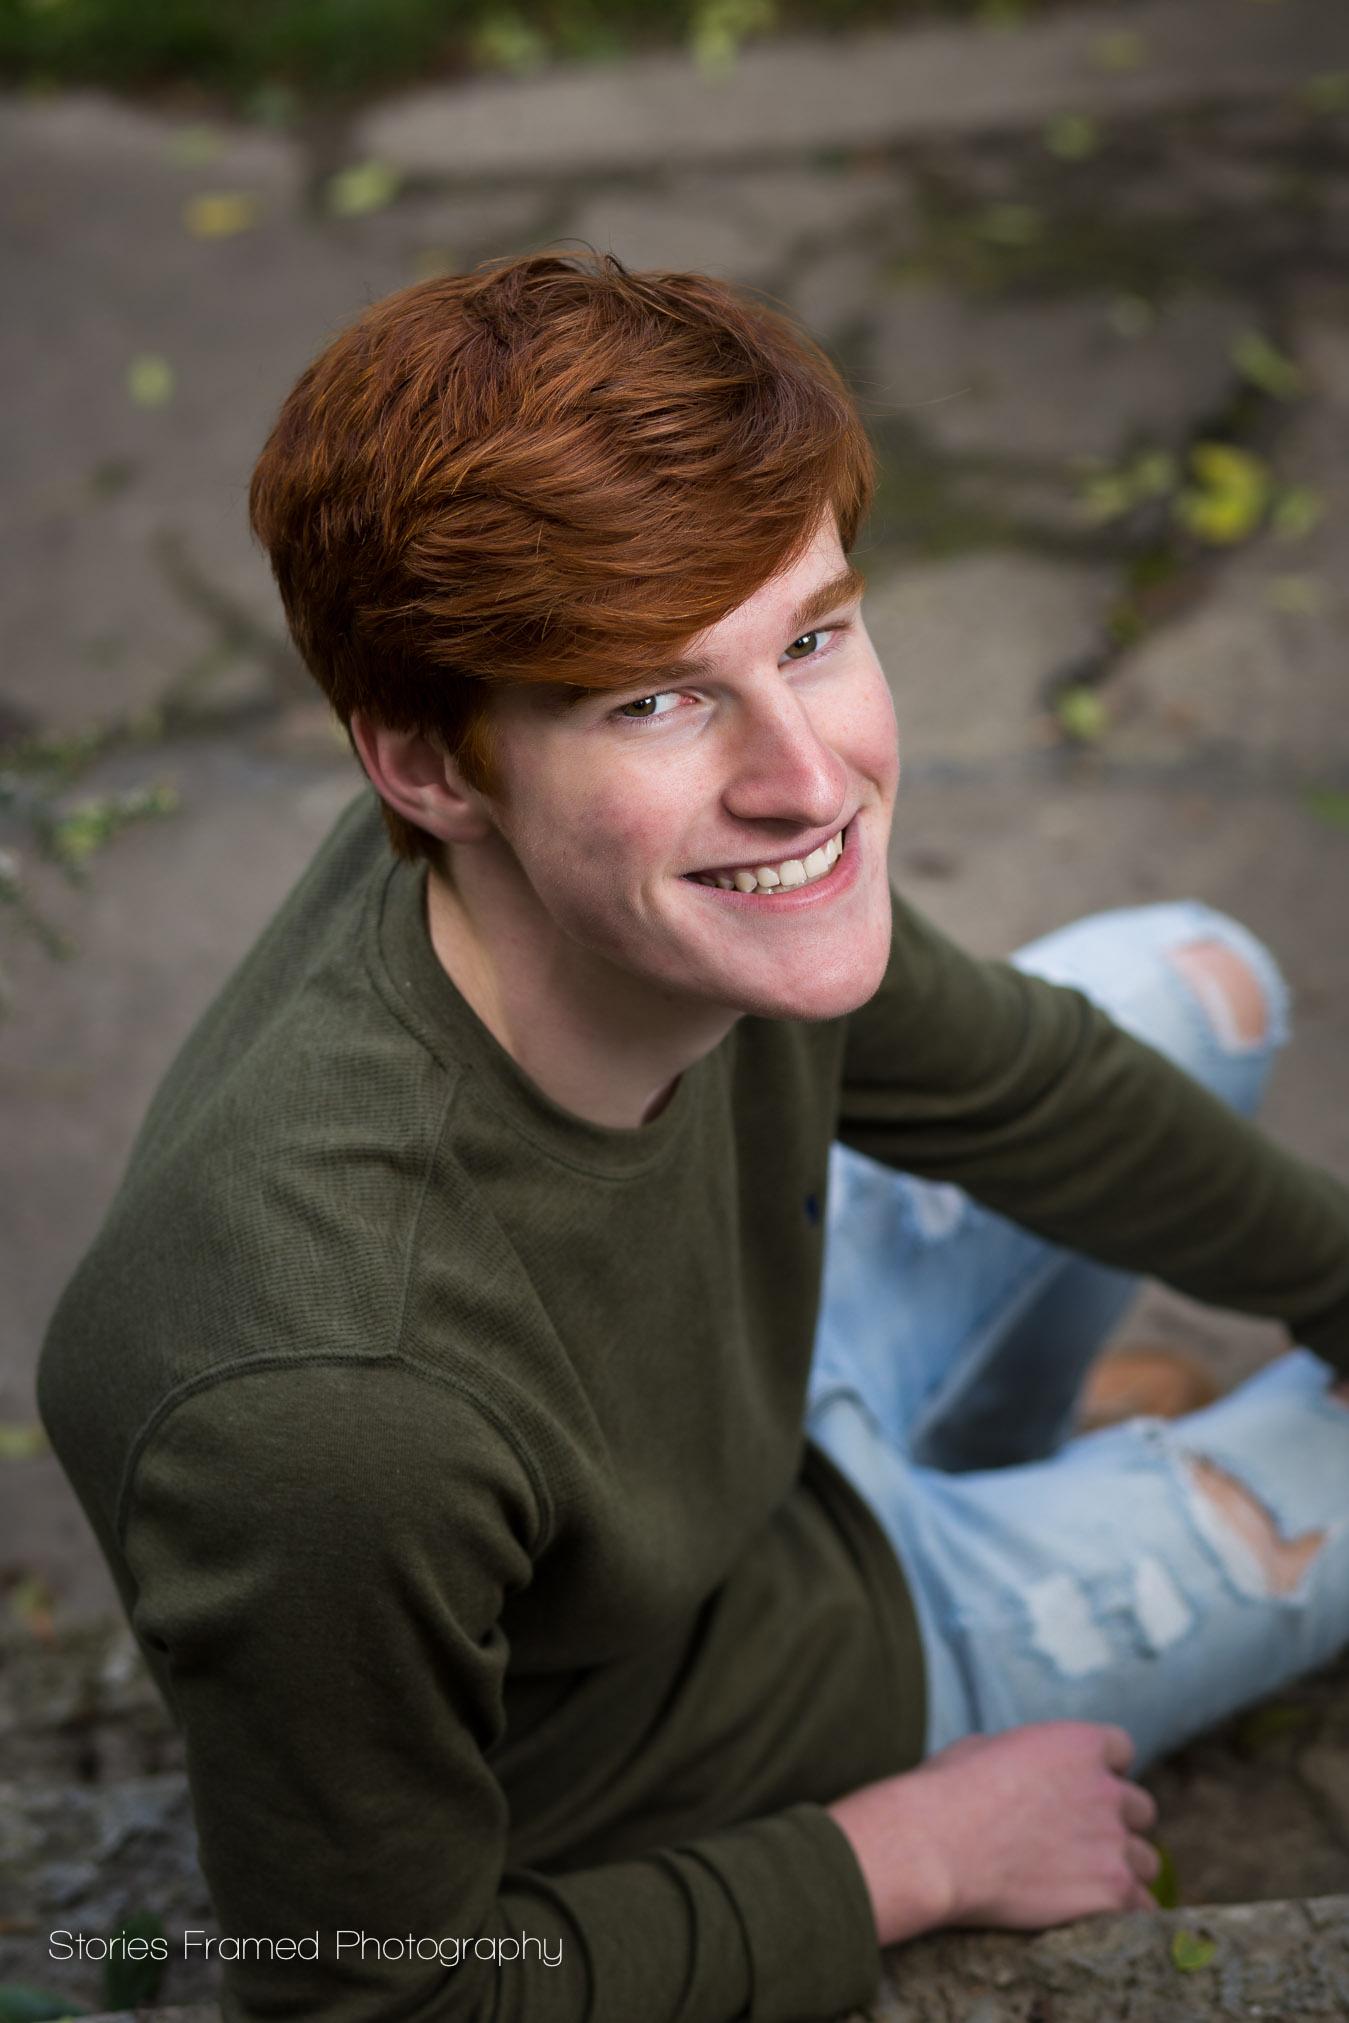 high-school-senior-redhead-looking-up-.jpg